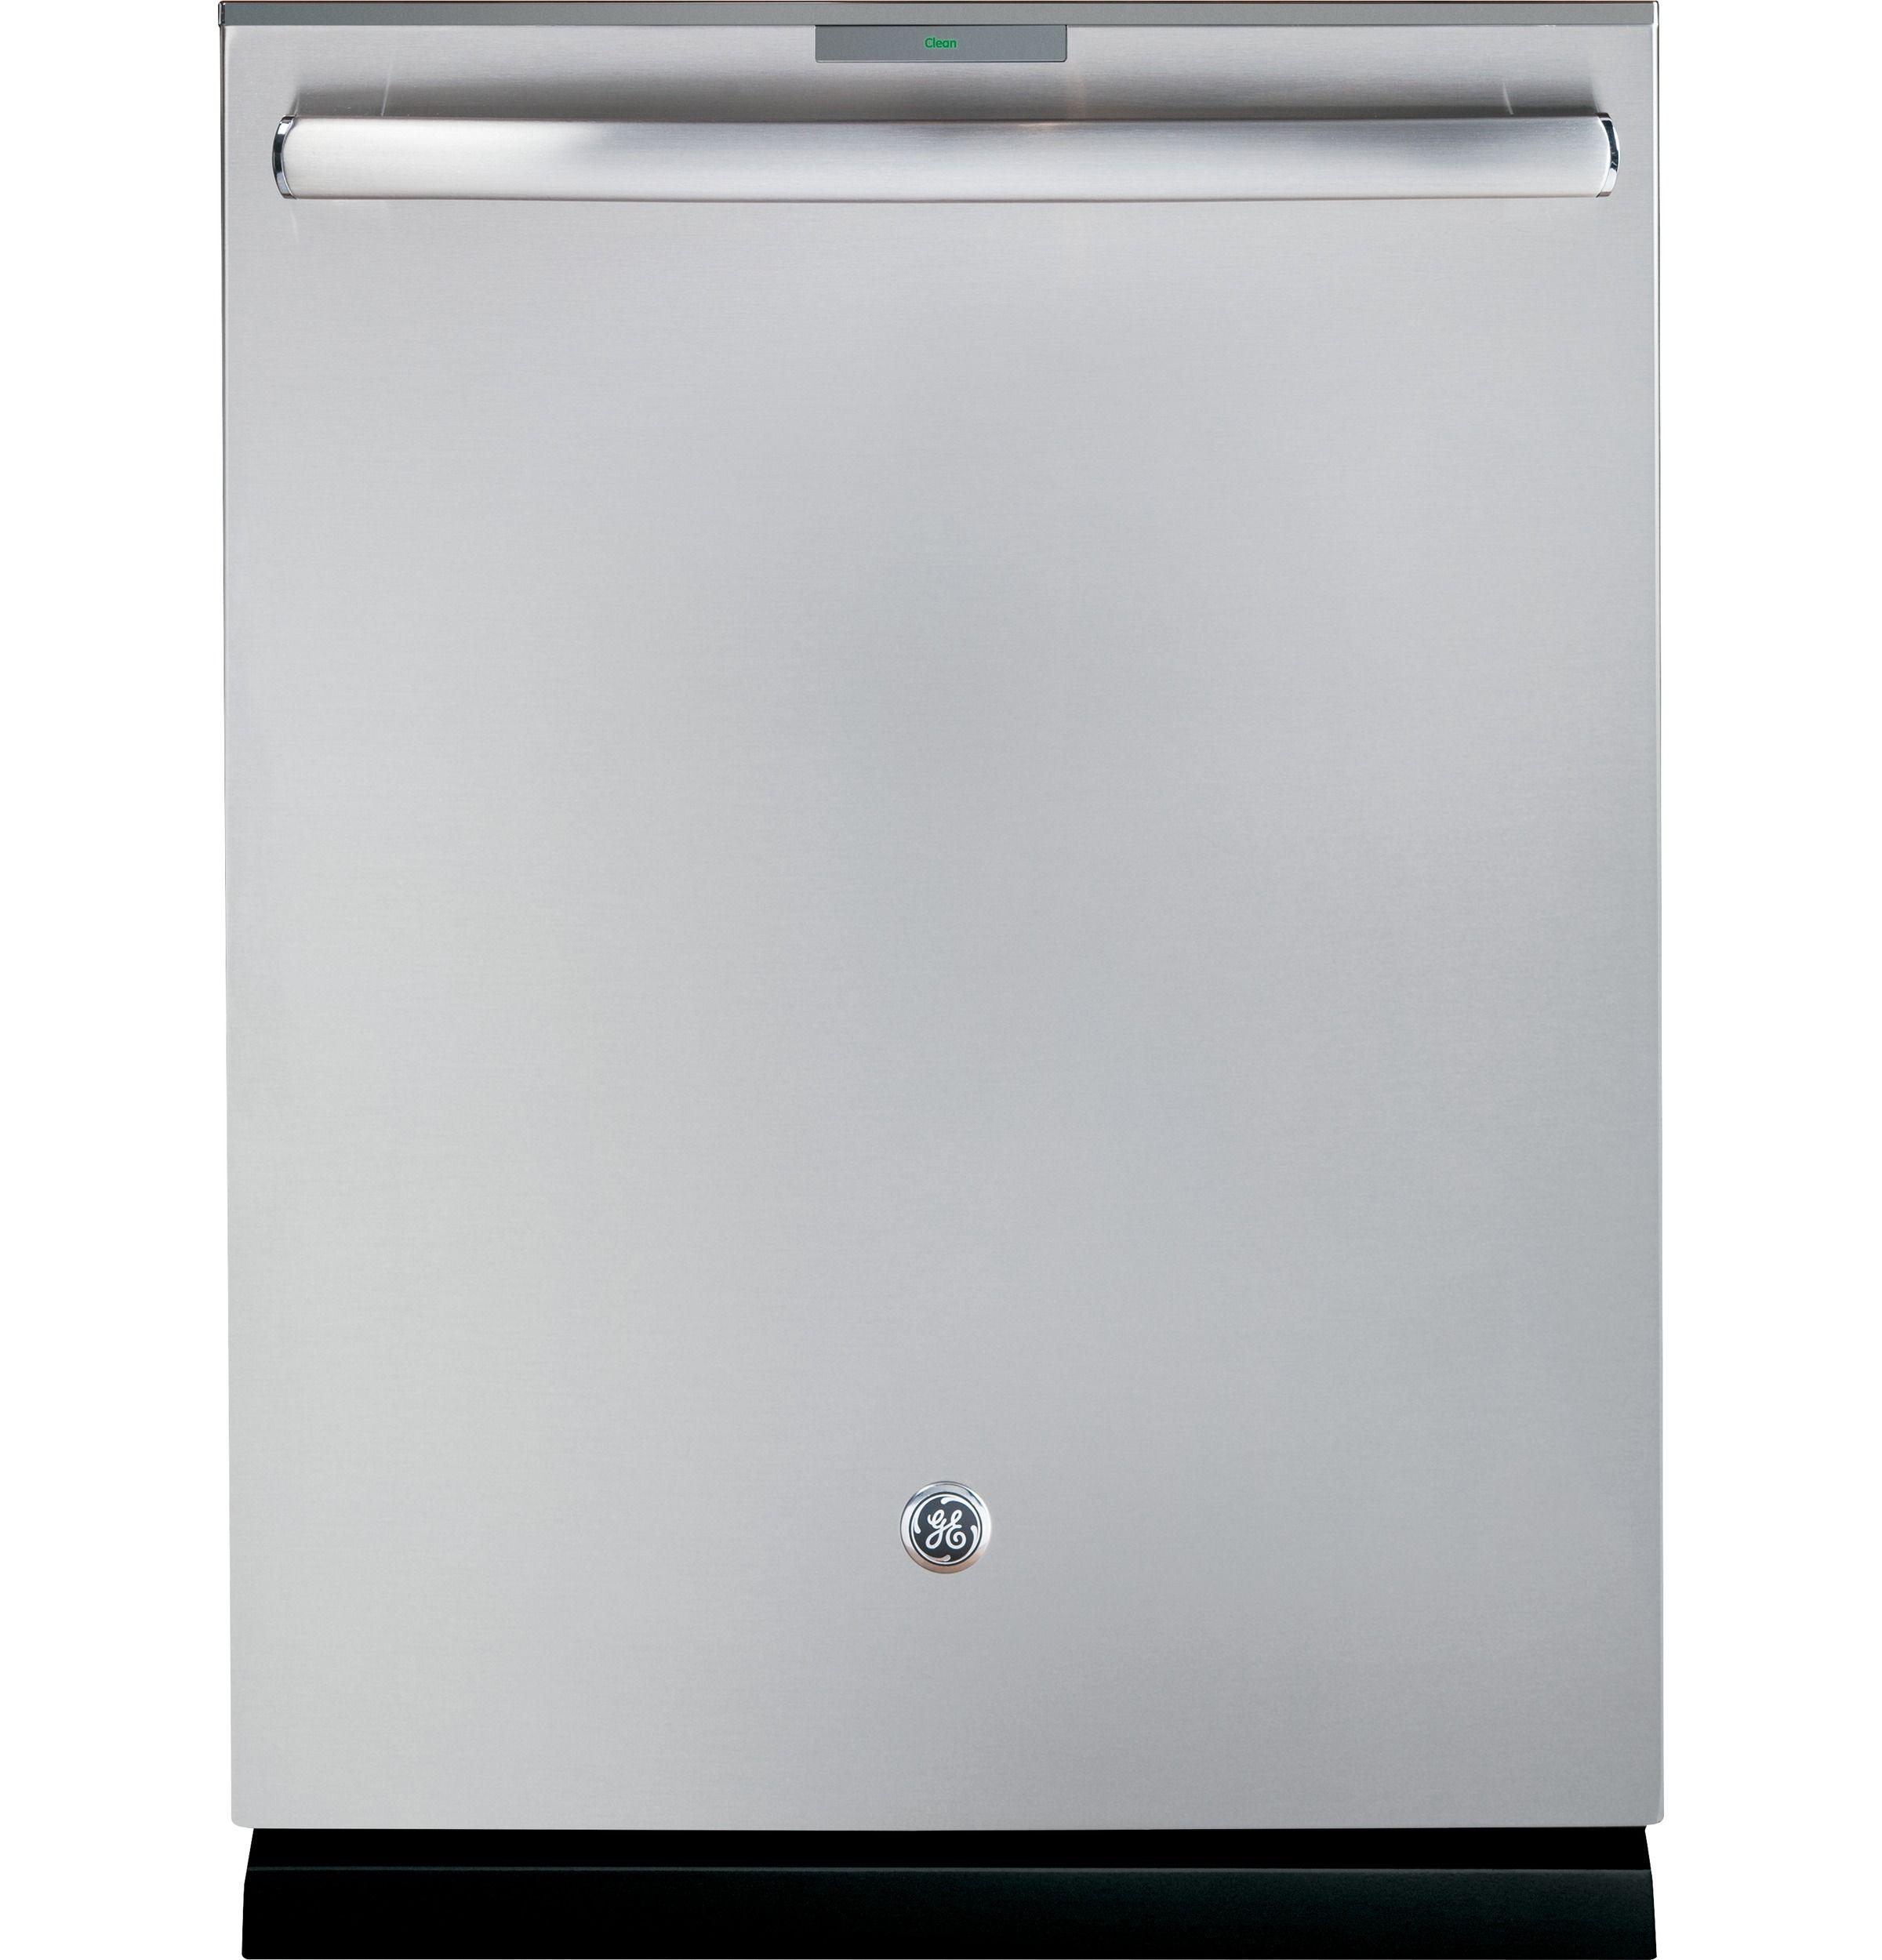 Ge Profile Series Stainless Steel Interior Dishwasher With Hidden Controls Pdt750ssfss Steel Tub Built In Dishwasher Ge Profile Dishwasher